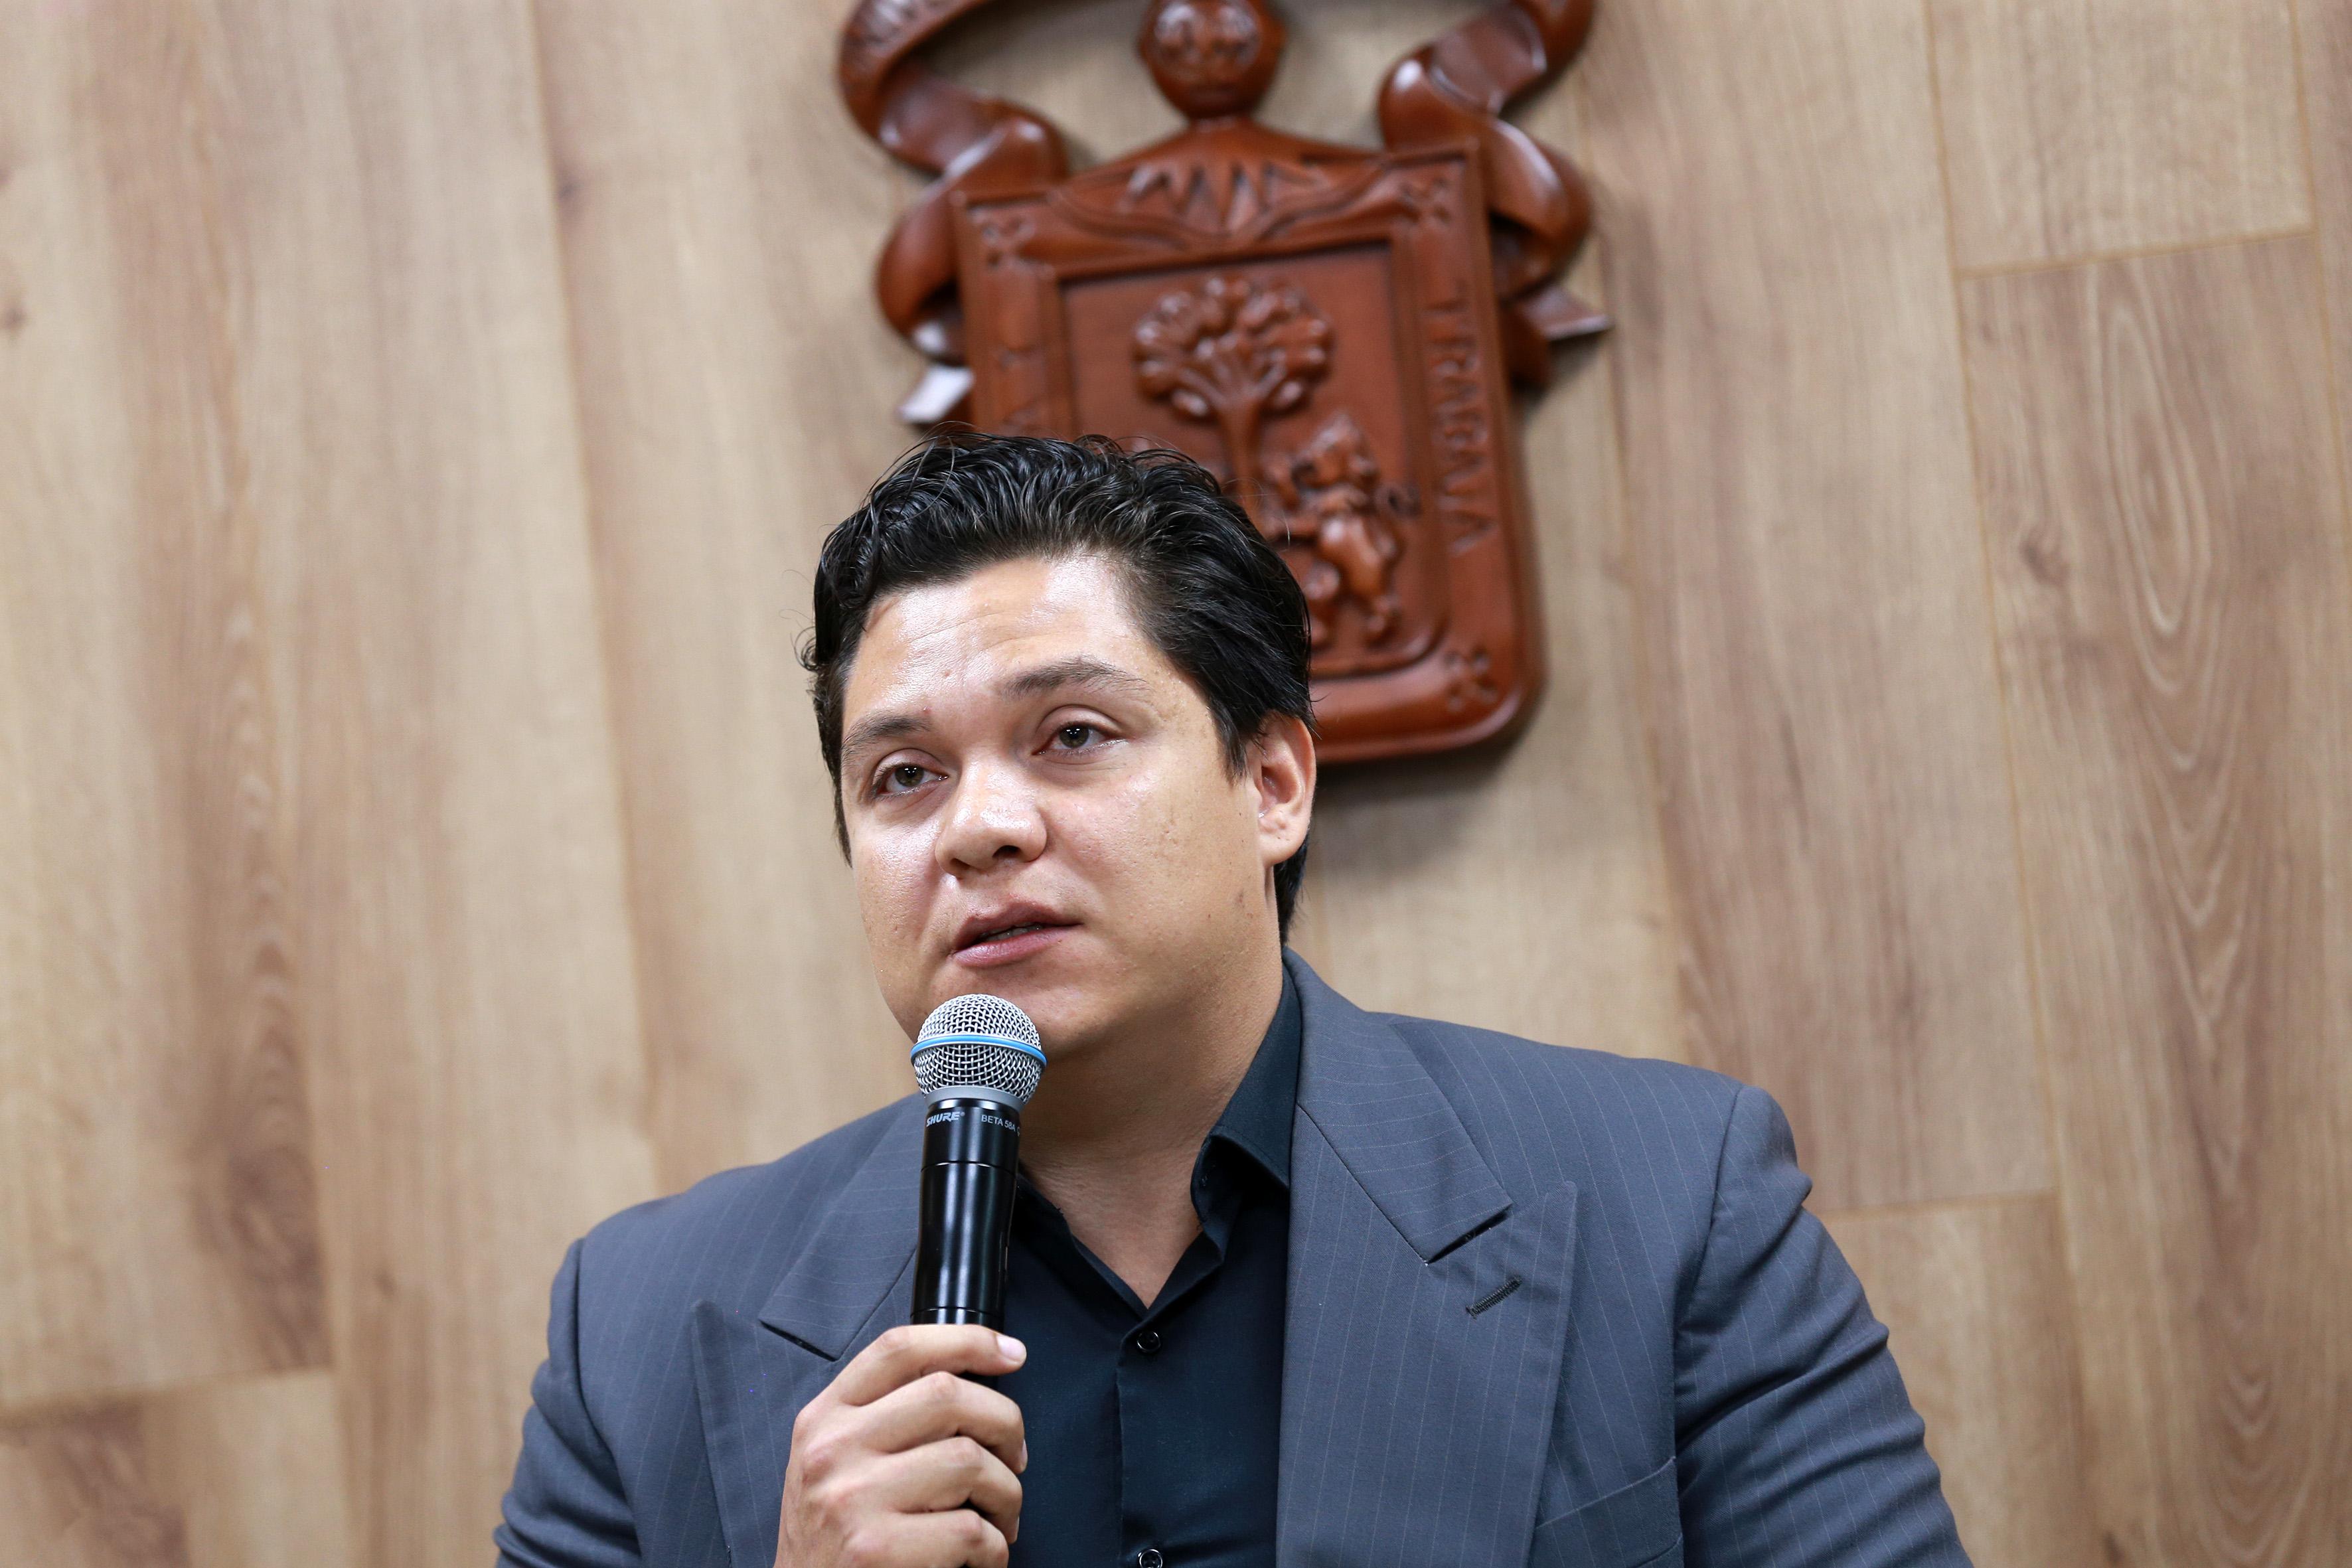 Lic Víctor Orozco al micrófono, toma cerrada